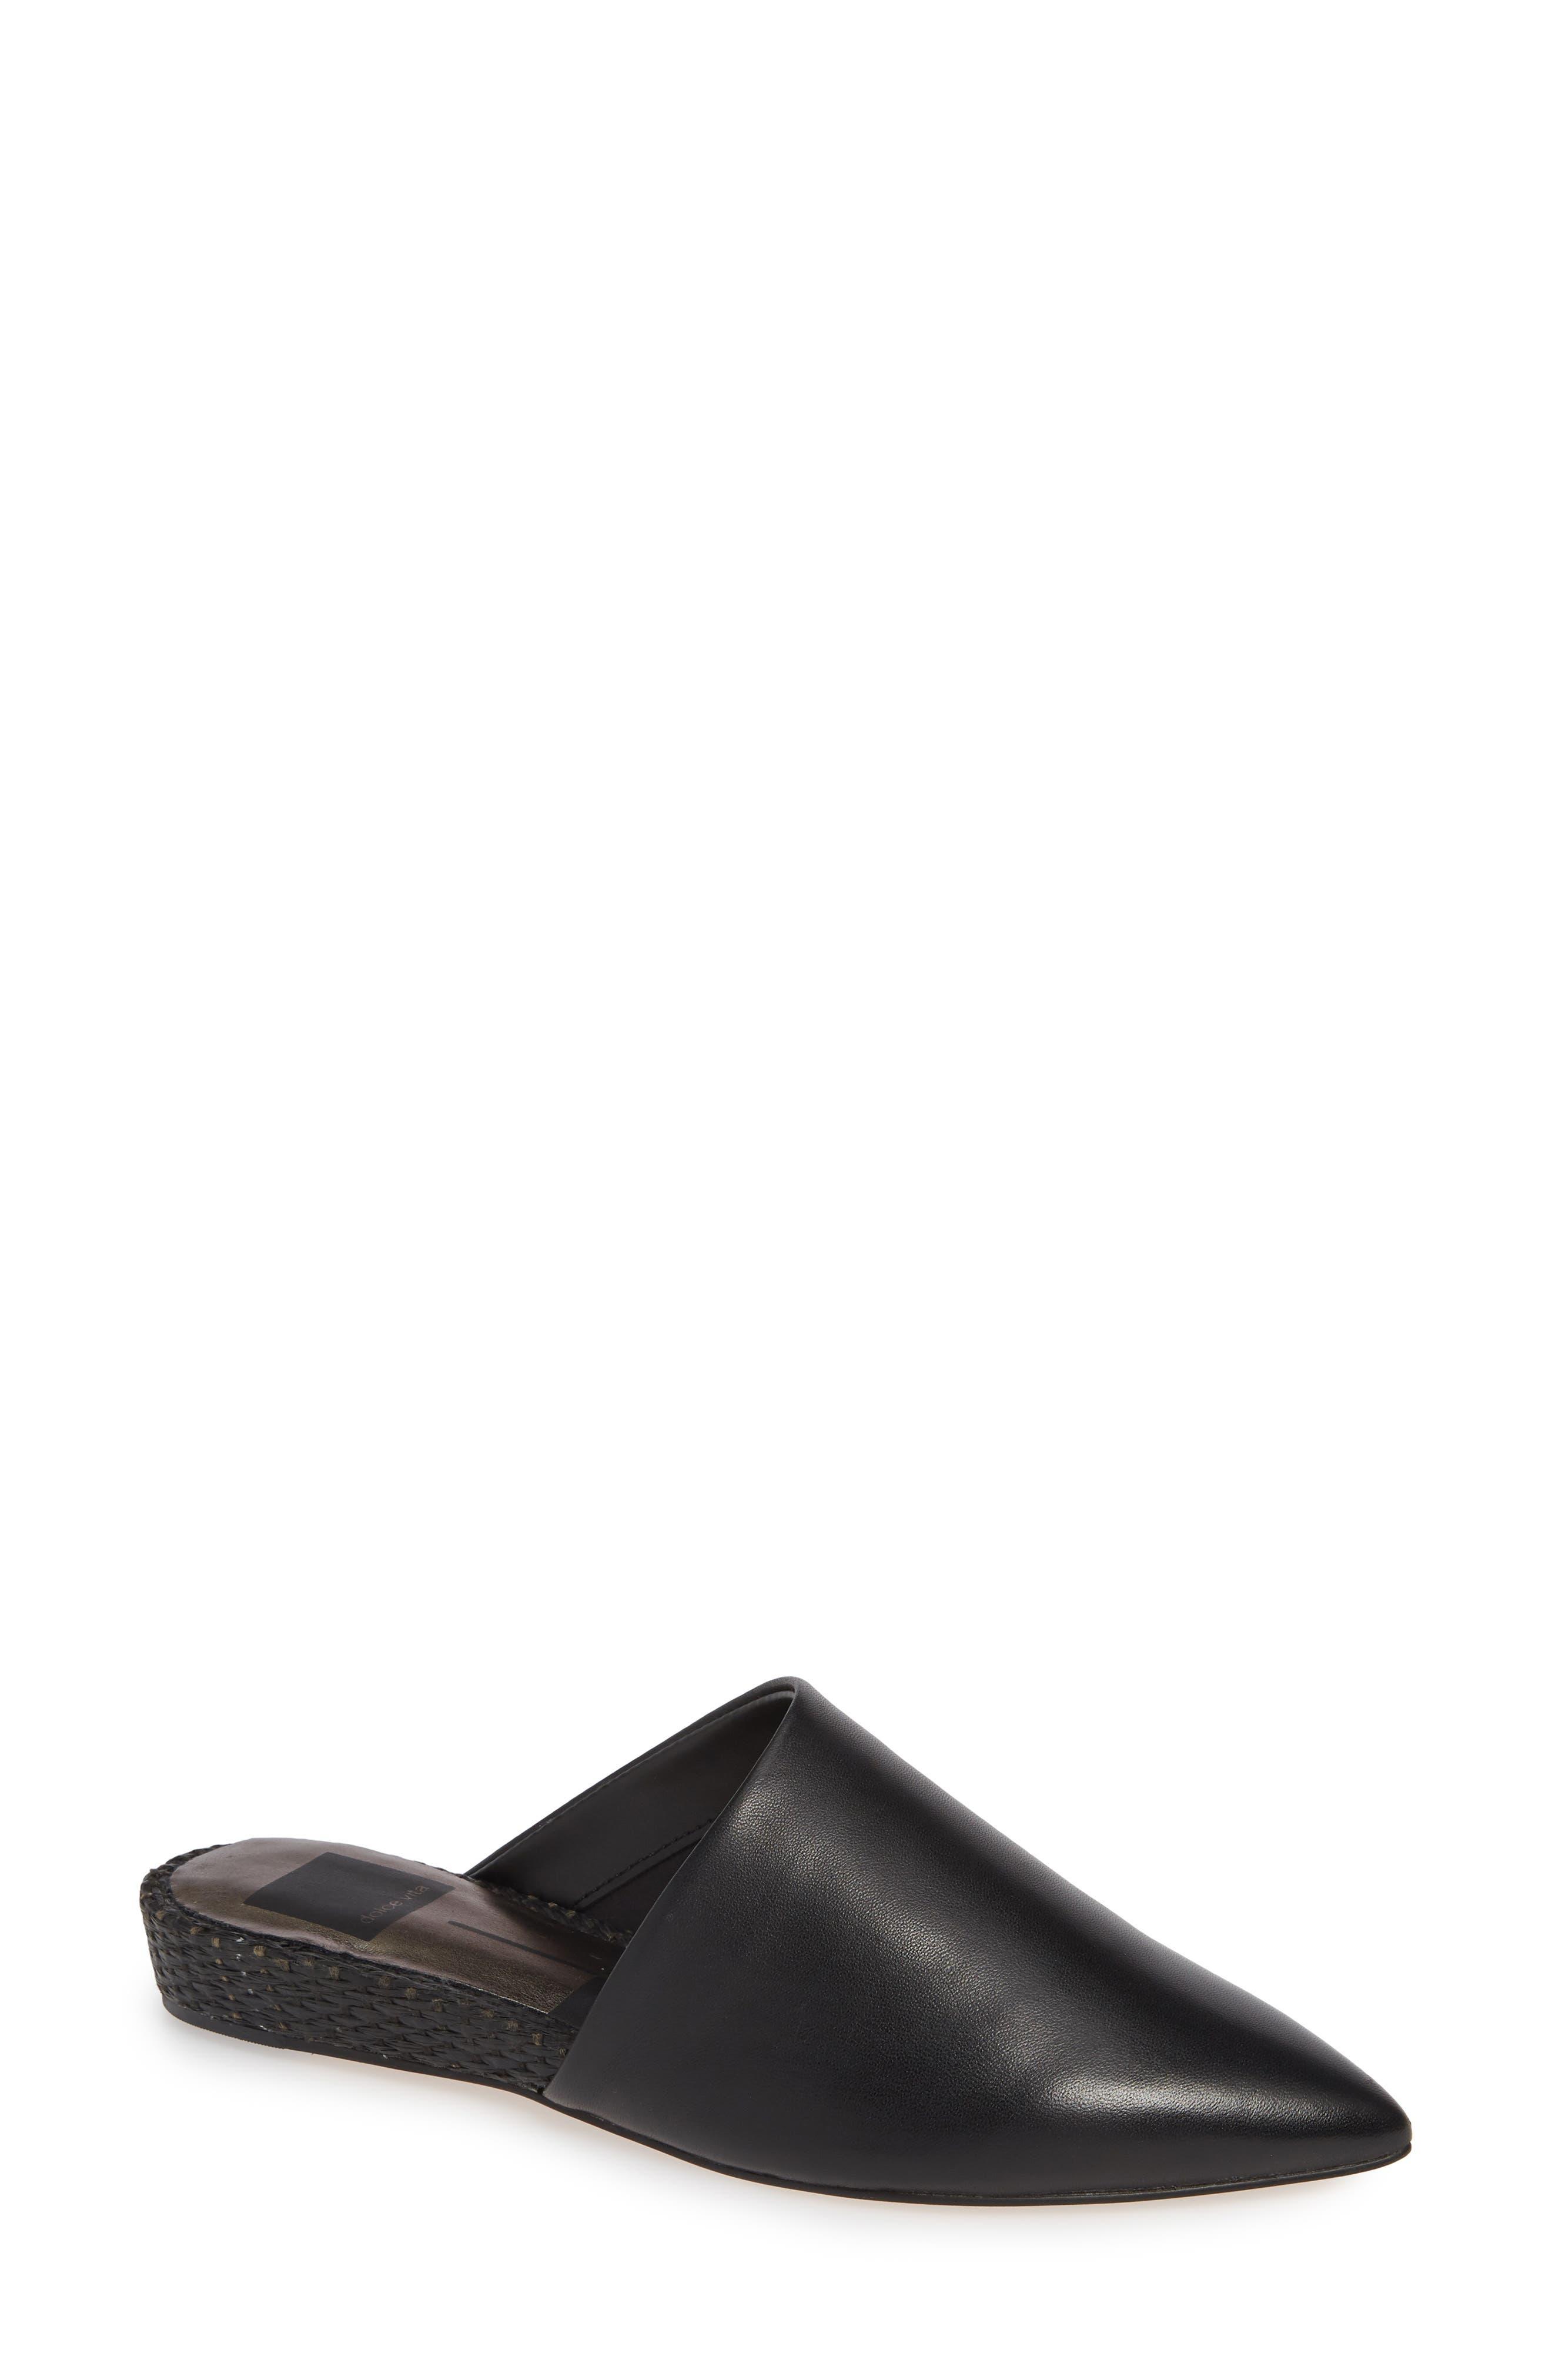 DOLCE VITA Ekko Asymmetrical Mule, Main, color, BLACK LEATHER